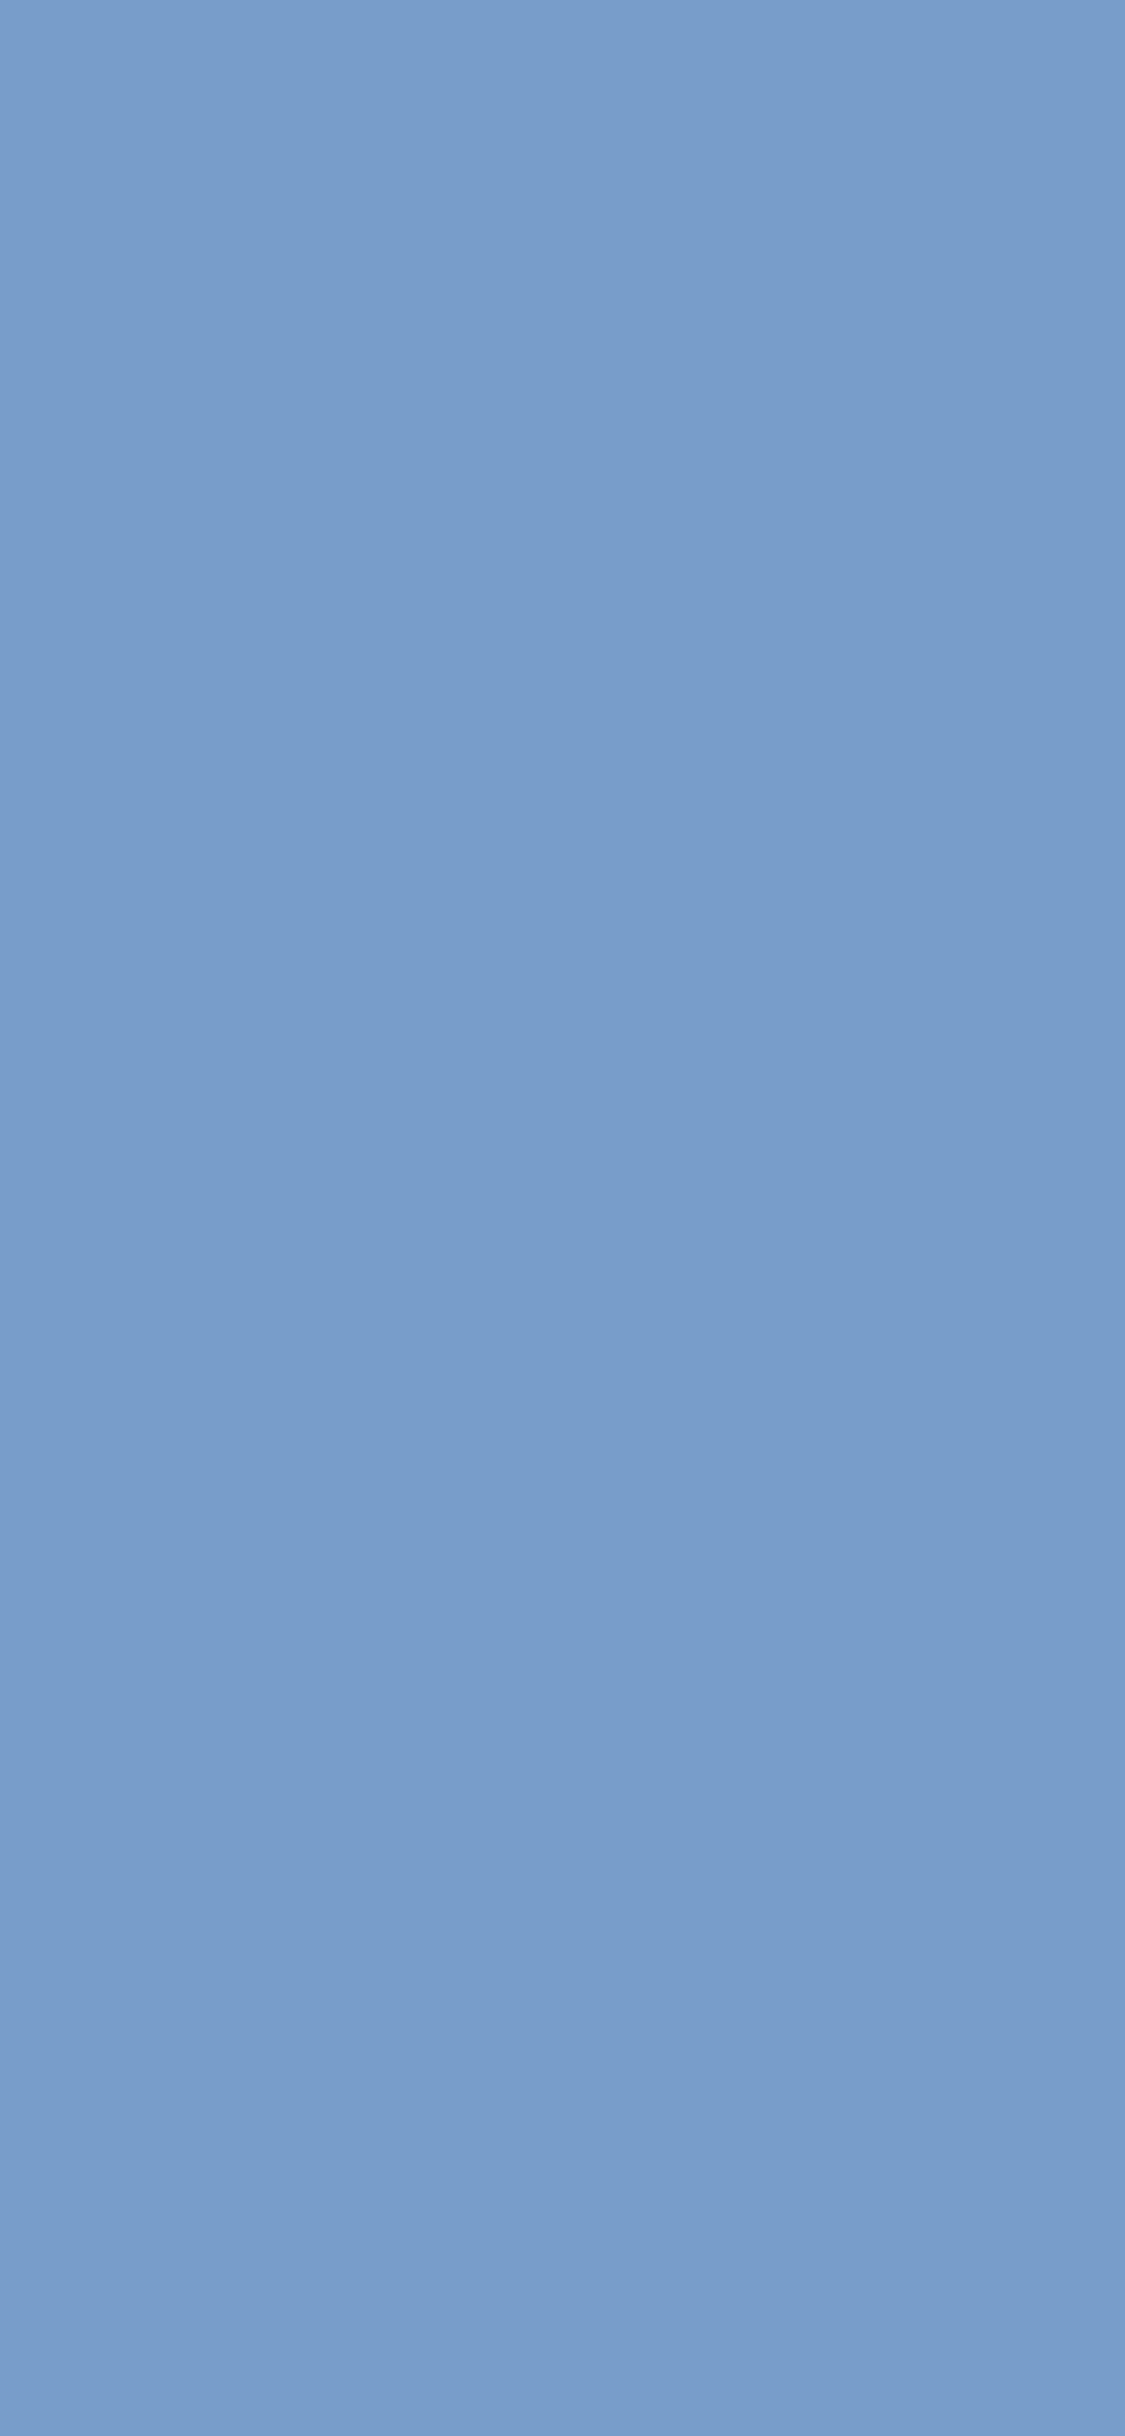 1125x2436 Dark Pastel Blue Solid Color Background